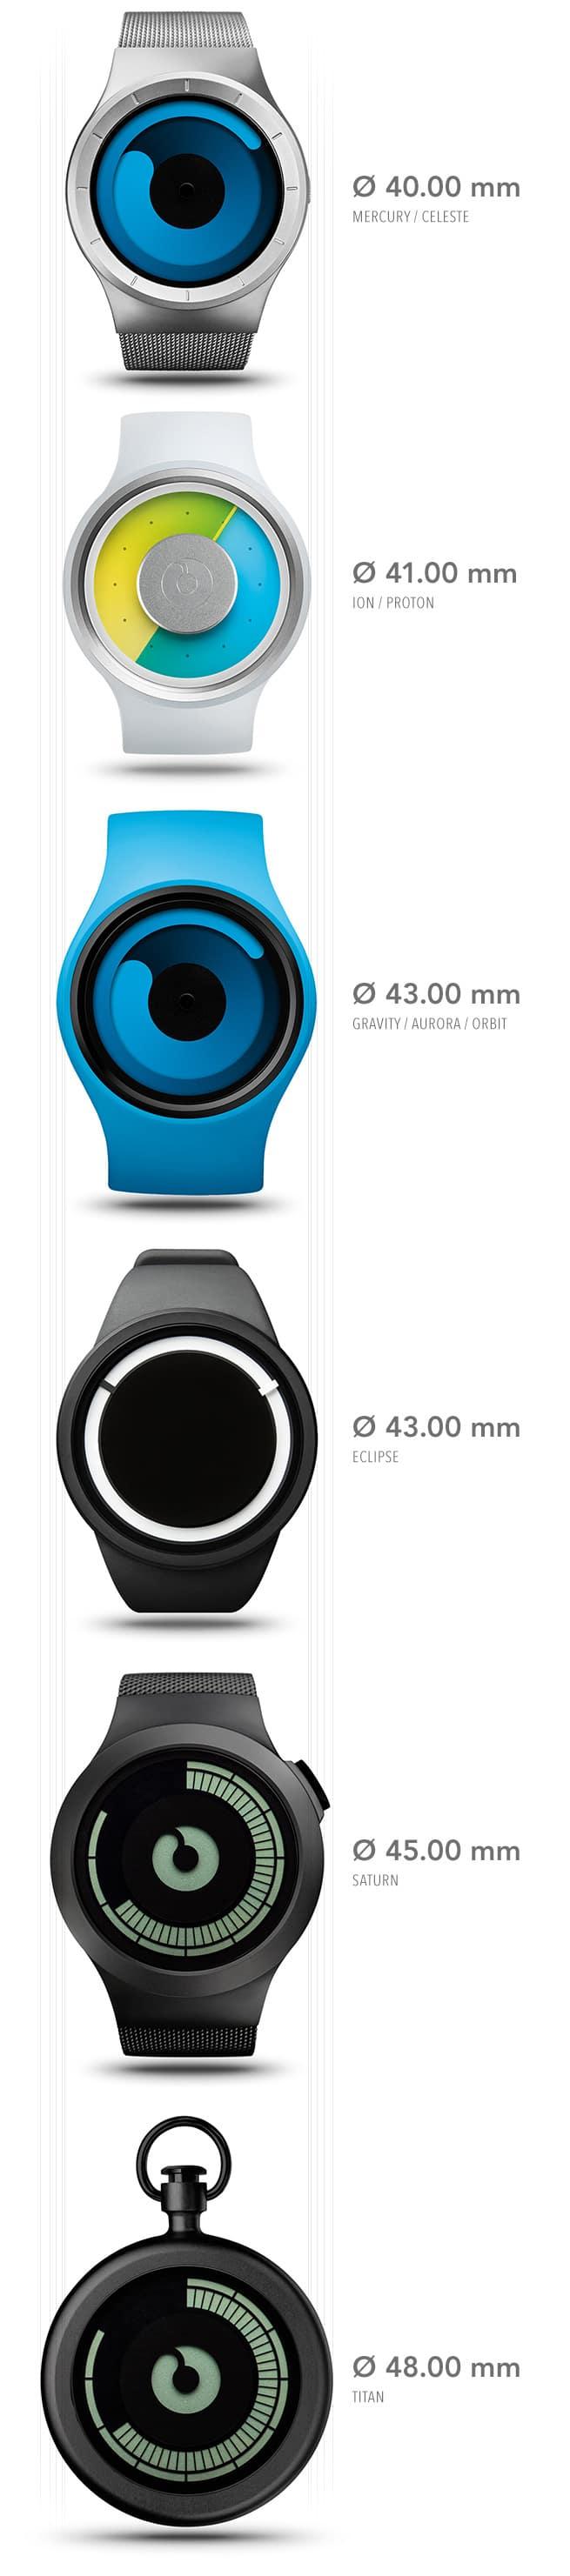 ZIIIRO Watch Sizes Casing